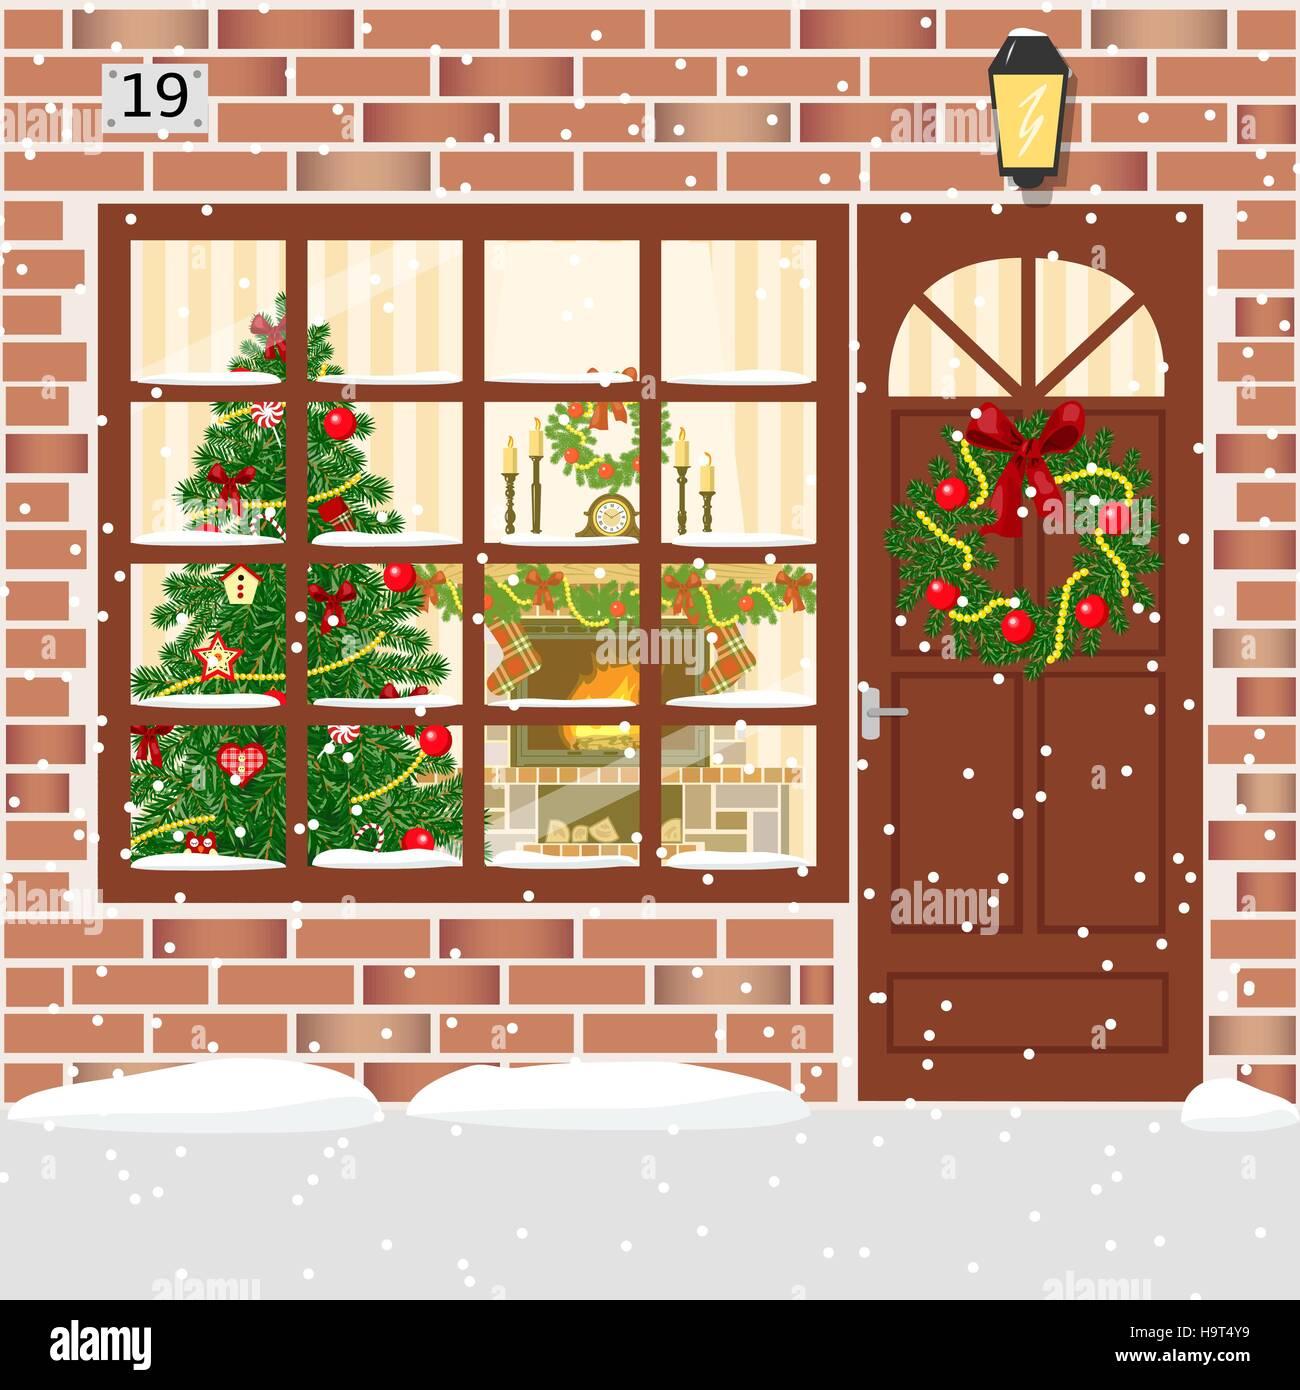 Christmas Room Stock Vector Image Of Illuminated: House Entrance Decoration Stock Photos & House Entrance